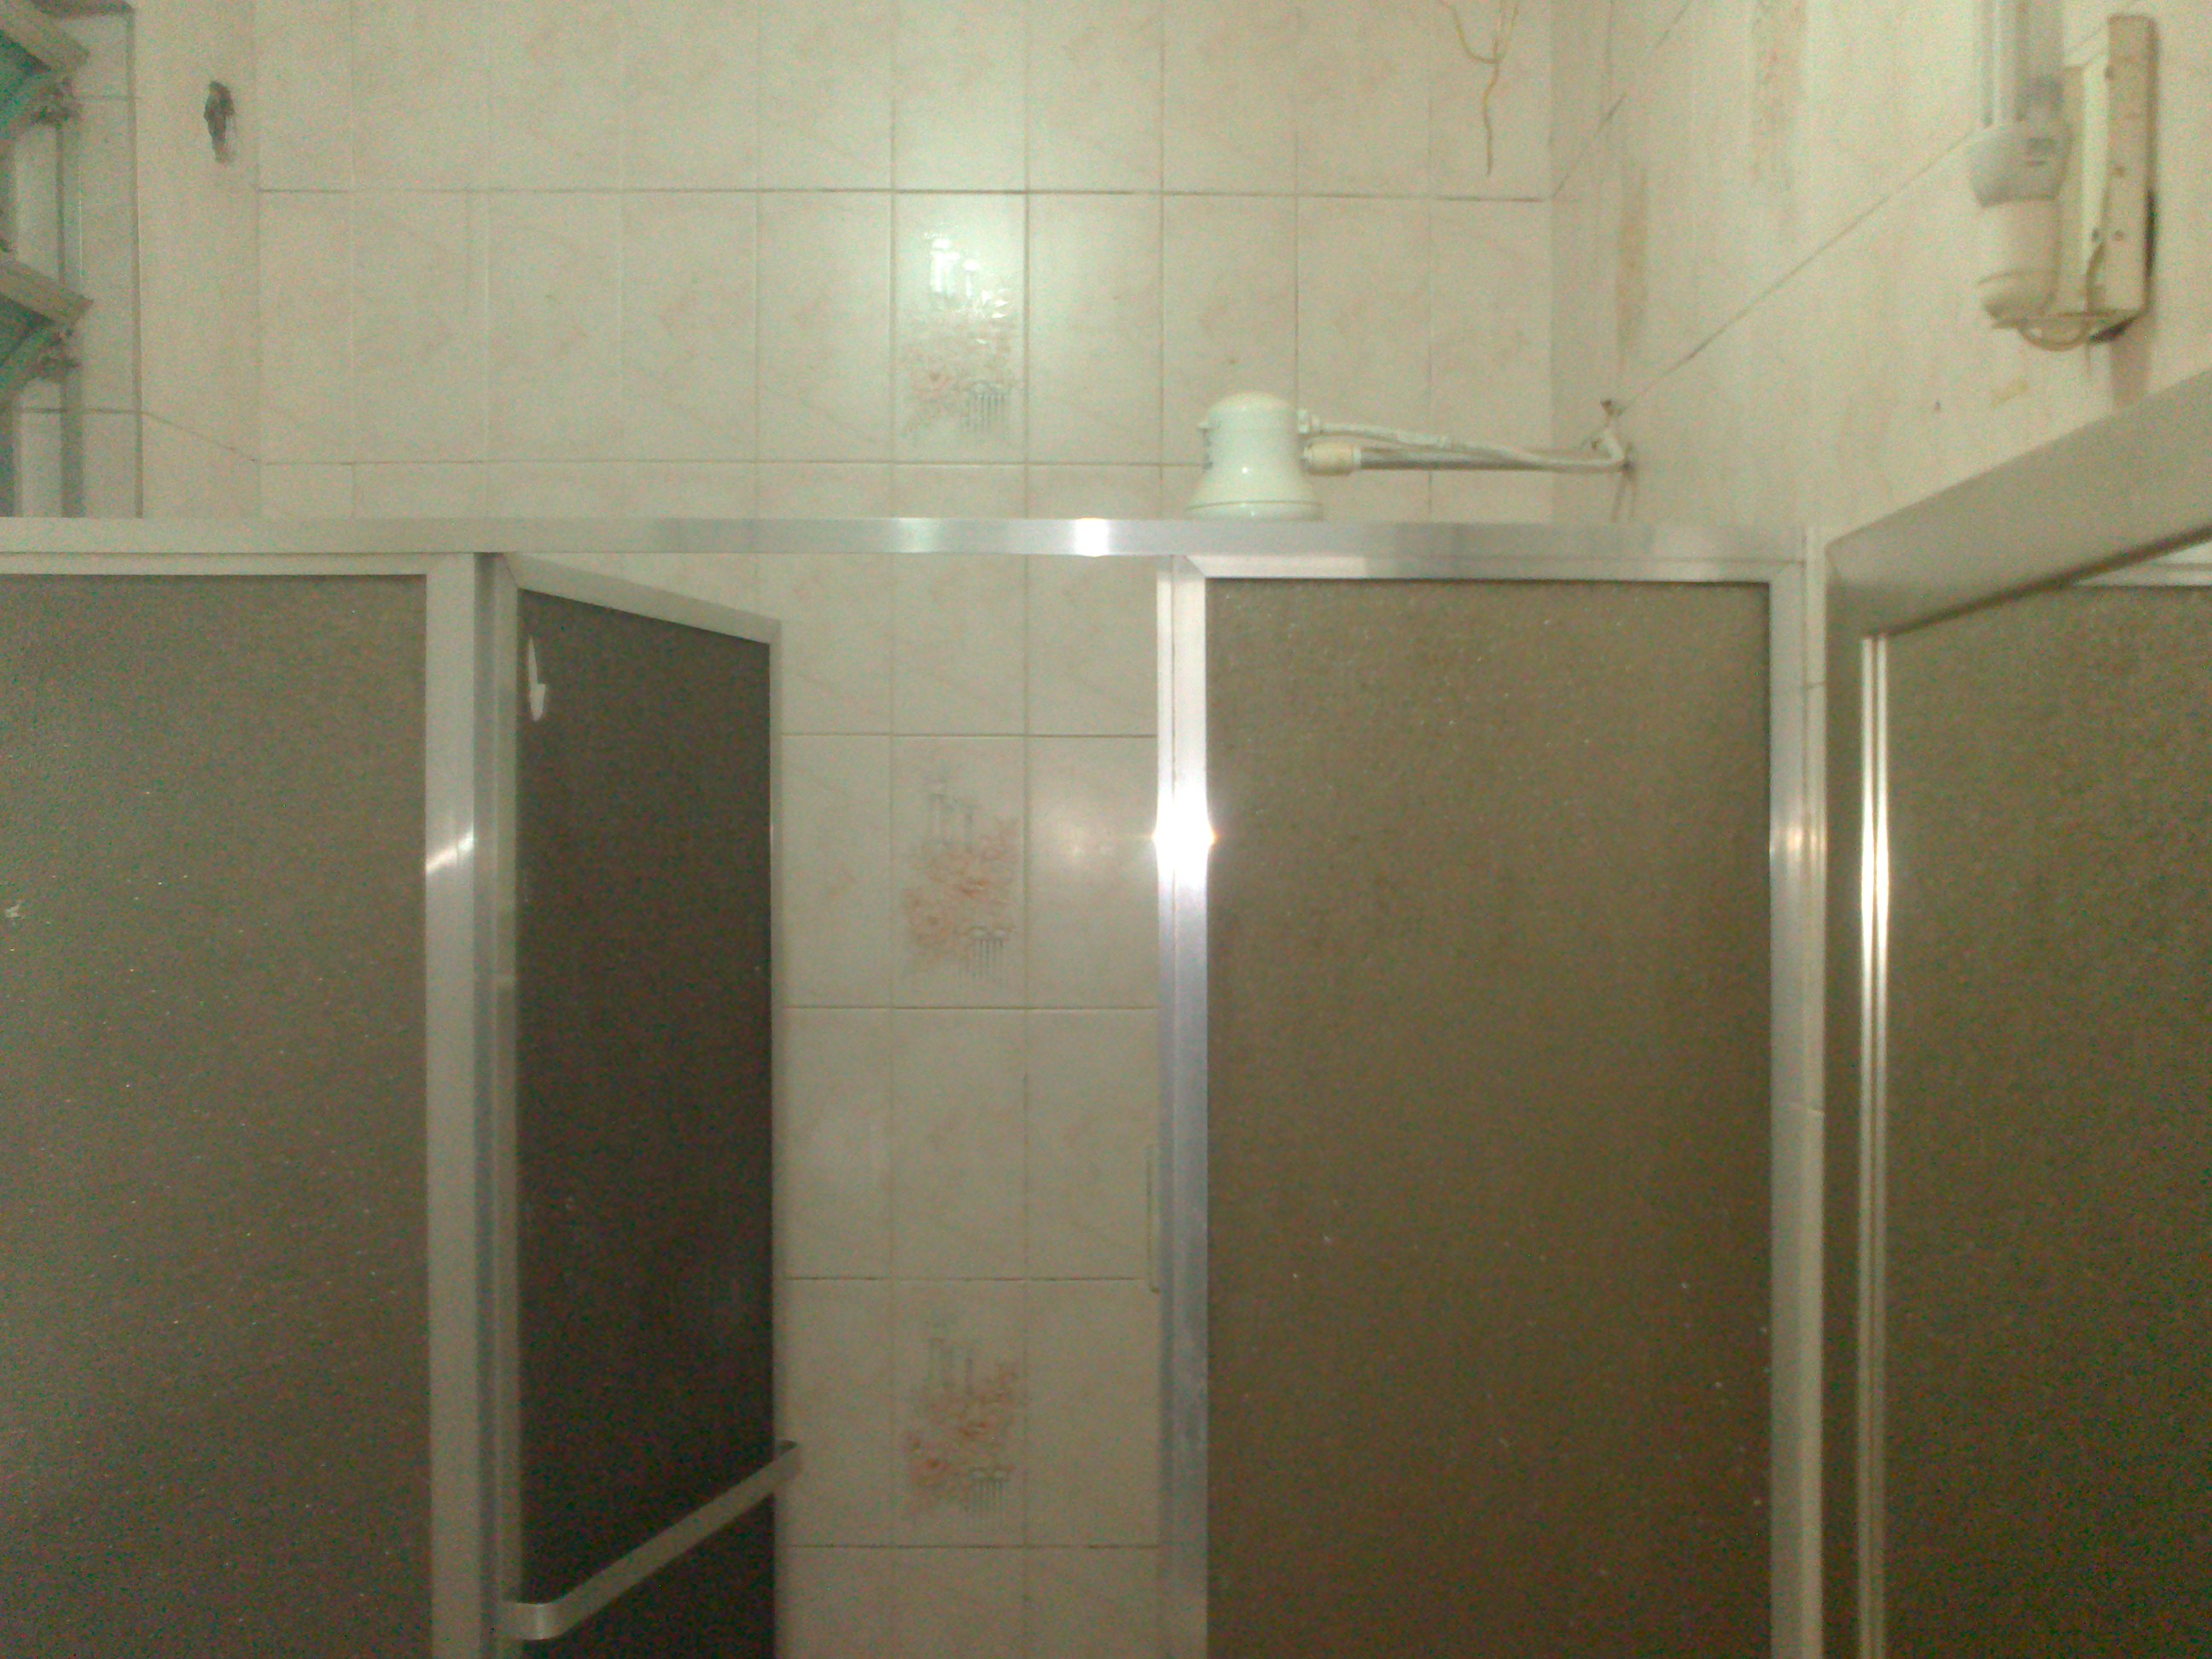 FOTO9 - Apartamento à venda Avenida Princesa Isabel,Copacabana, IMOBRAS RJ - R$ 442.000 - AP1297 - 11